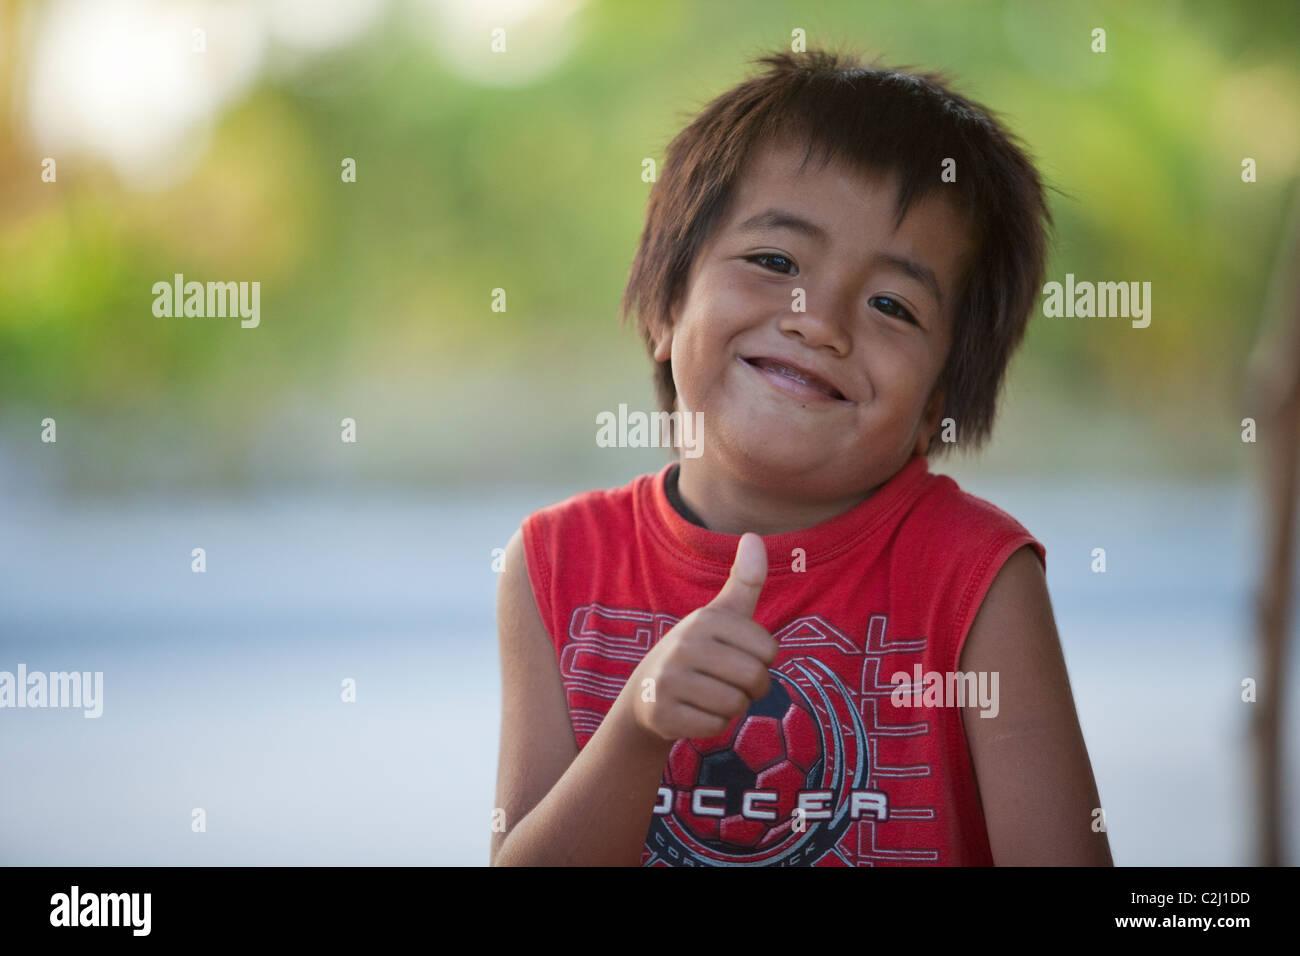 Kiritimati, Kiribati, Christmas Island, portrait of young island boy - Stock Image